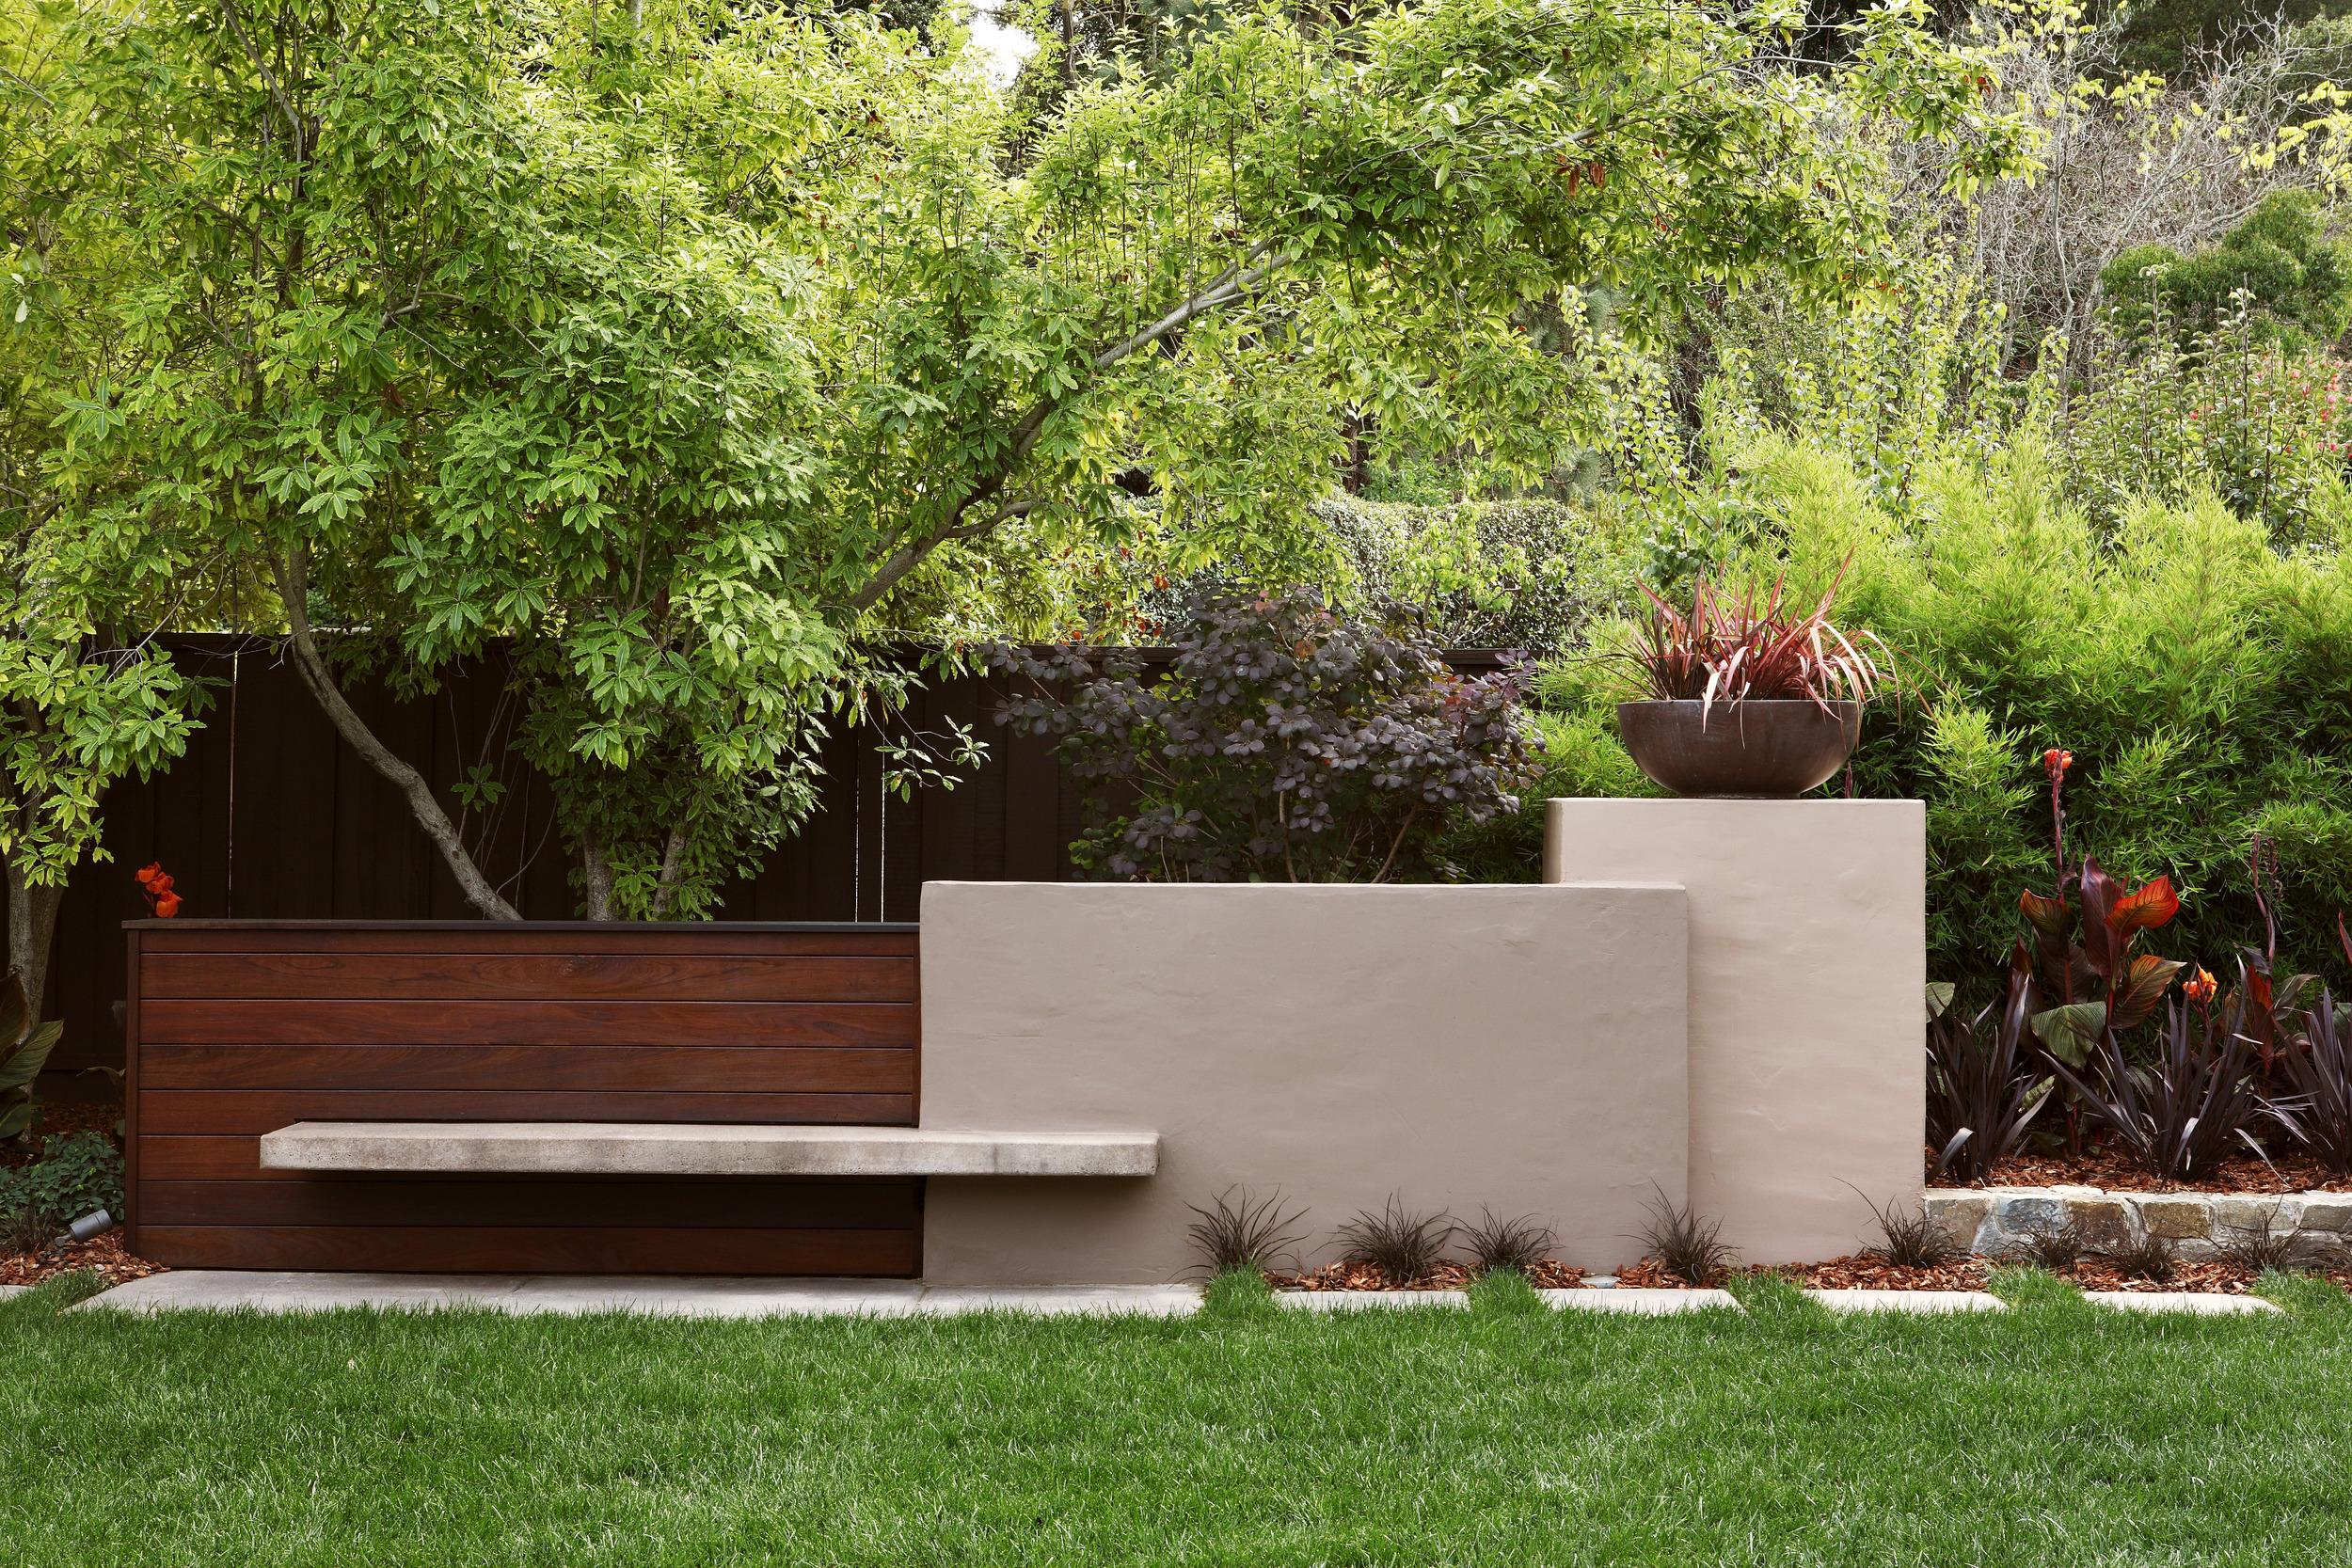 Garden as Sculpture by Arterra Landscape Architects